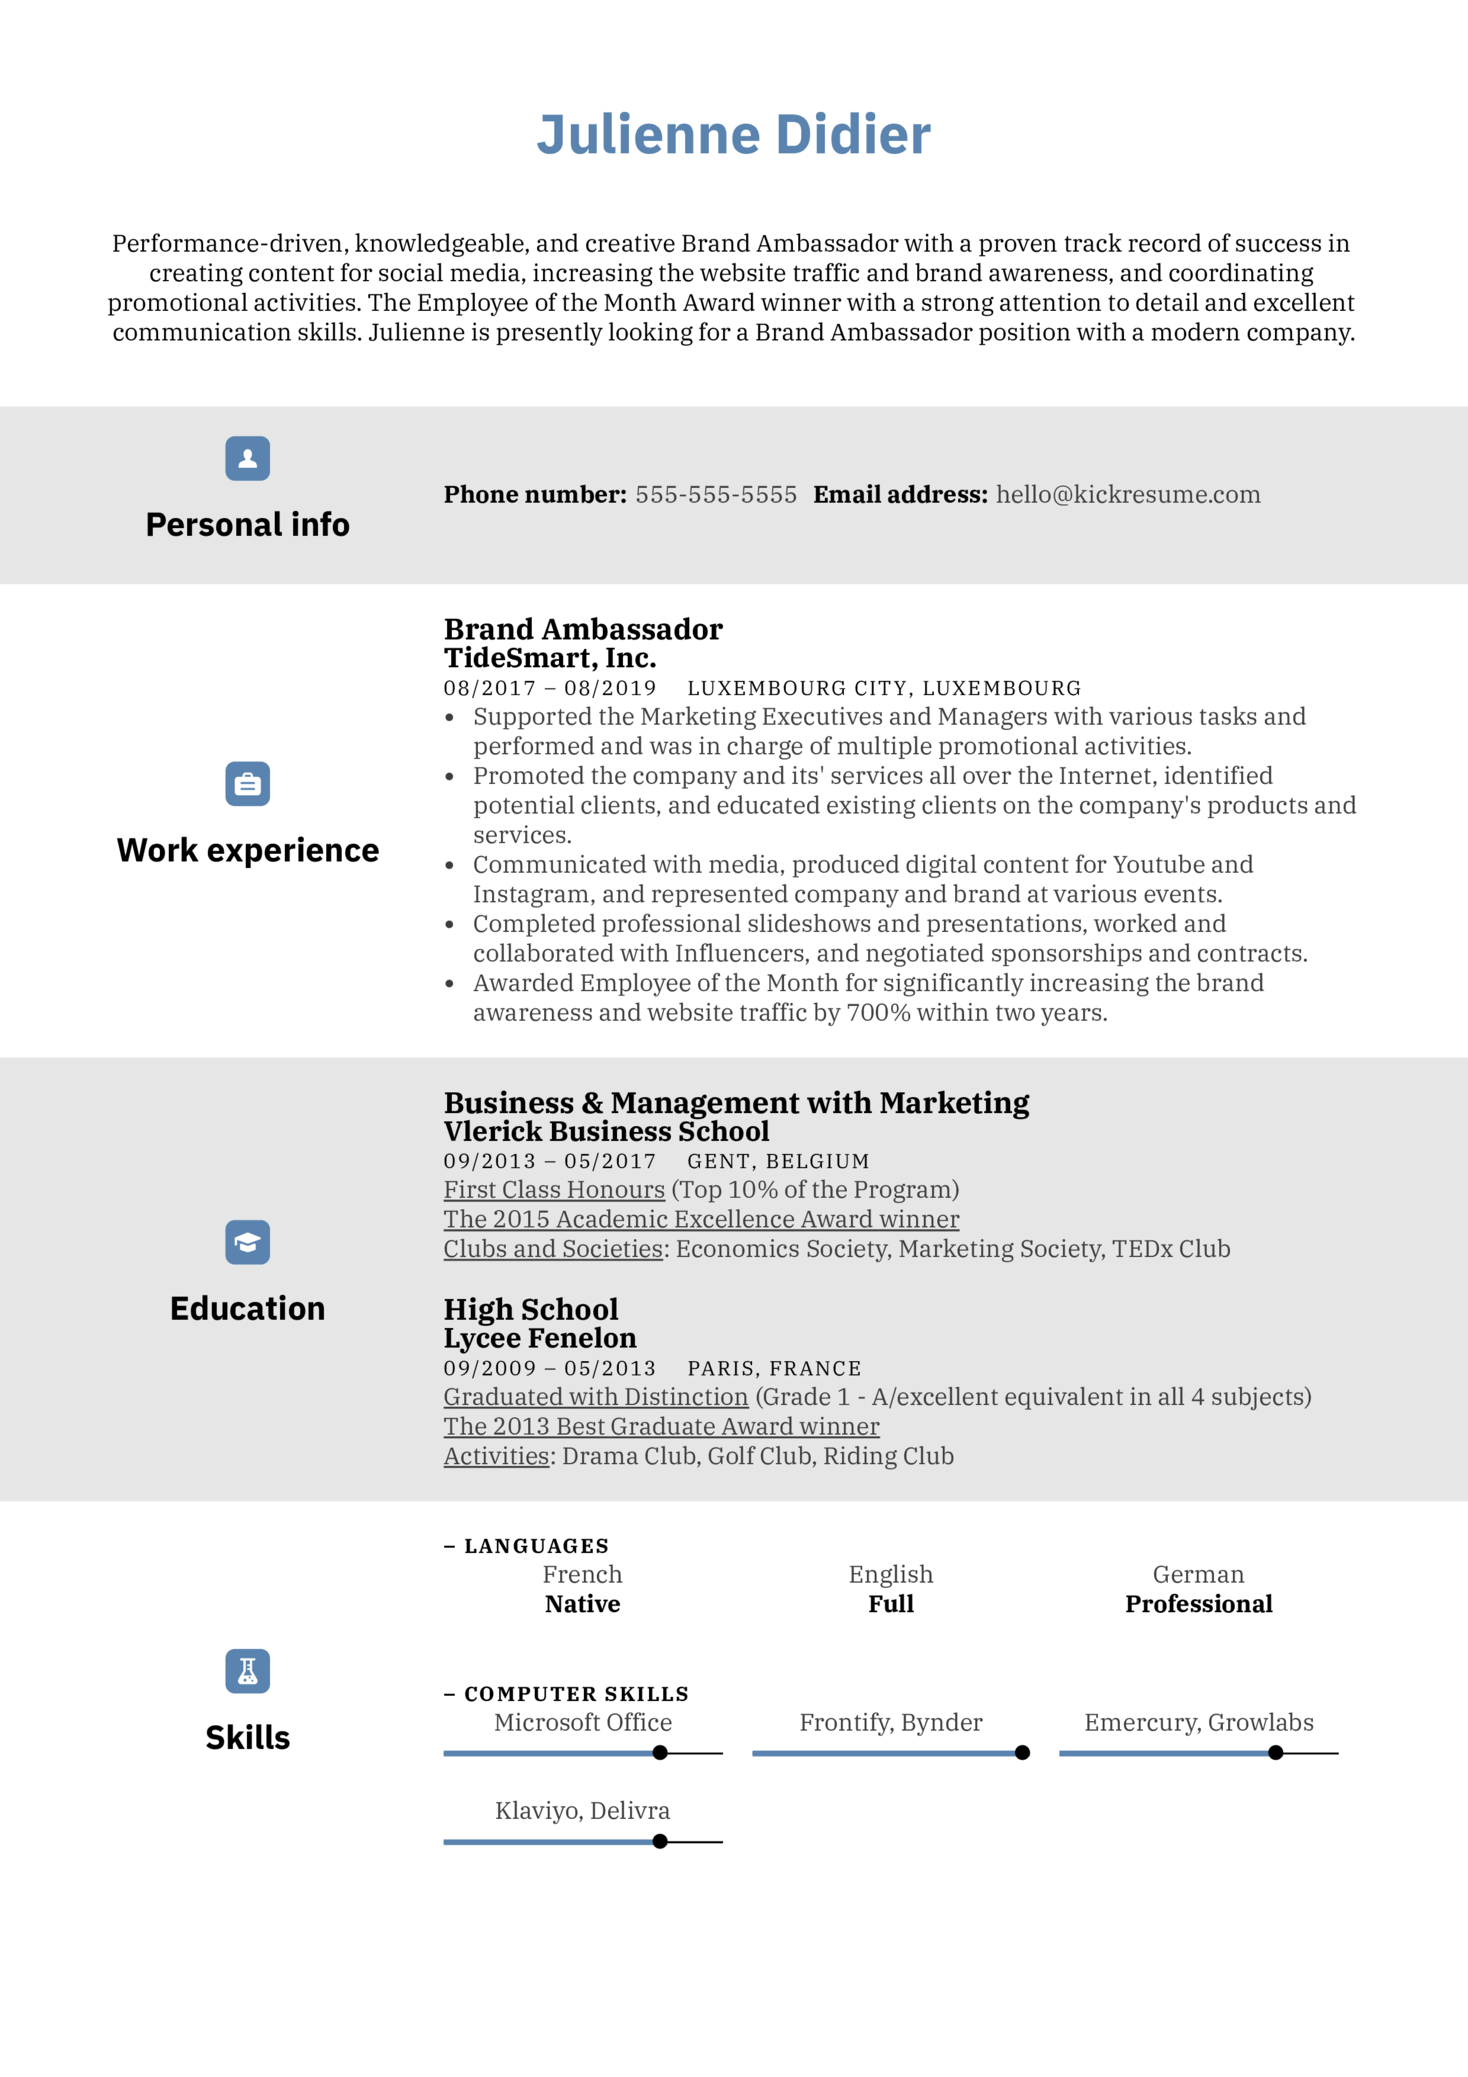 Brand Ambassador Resume Example (Teil 1)